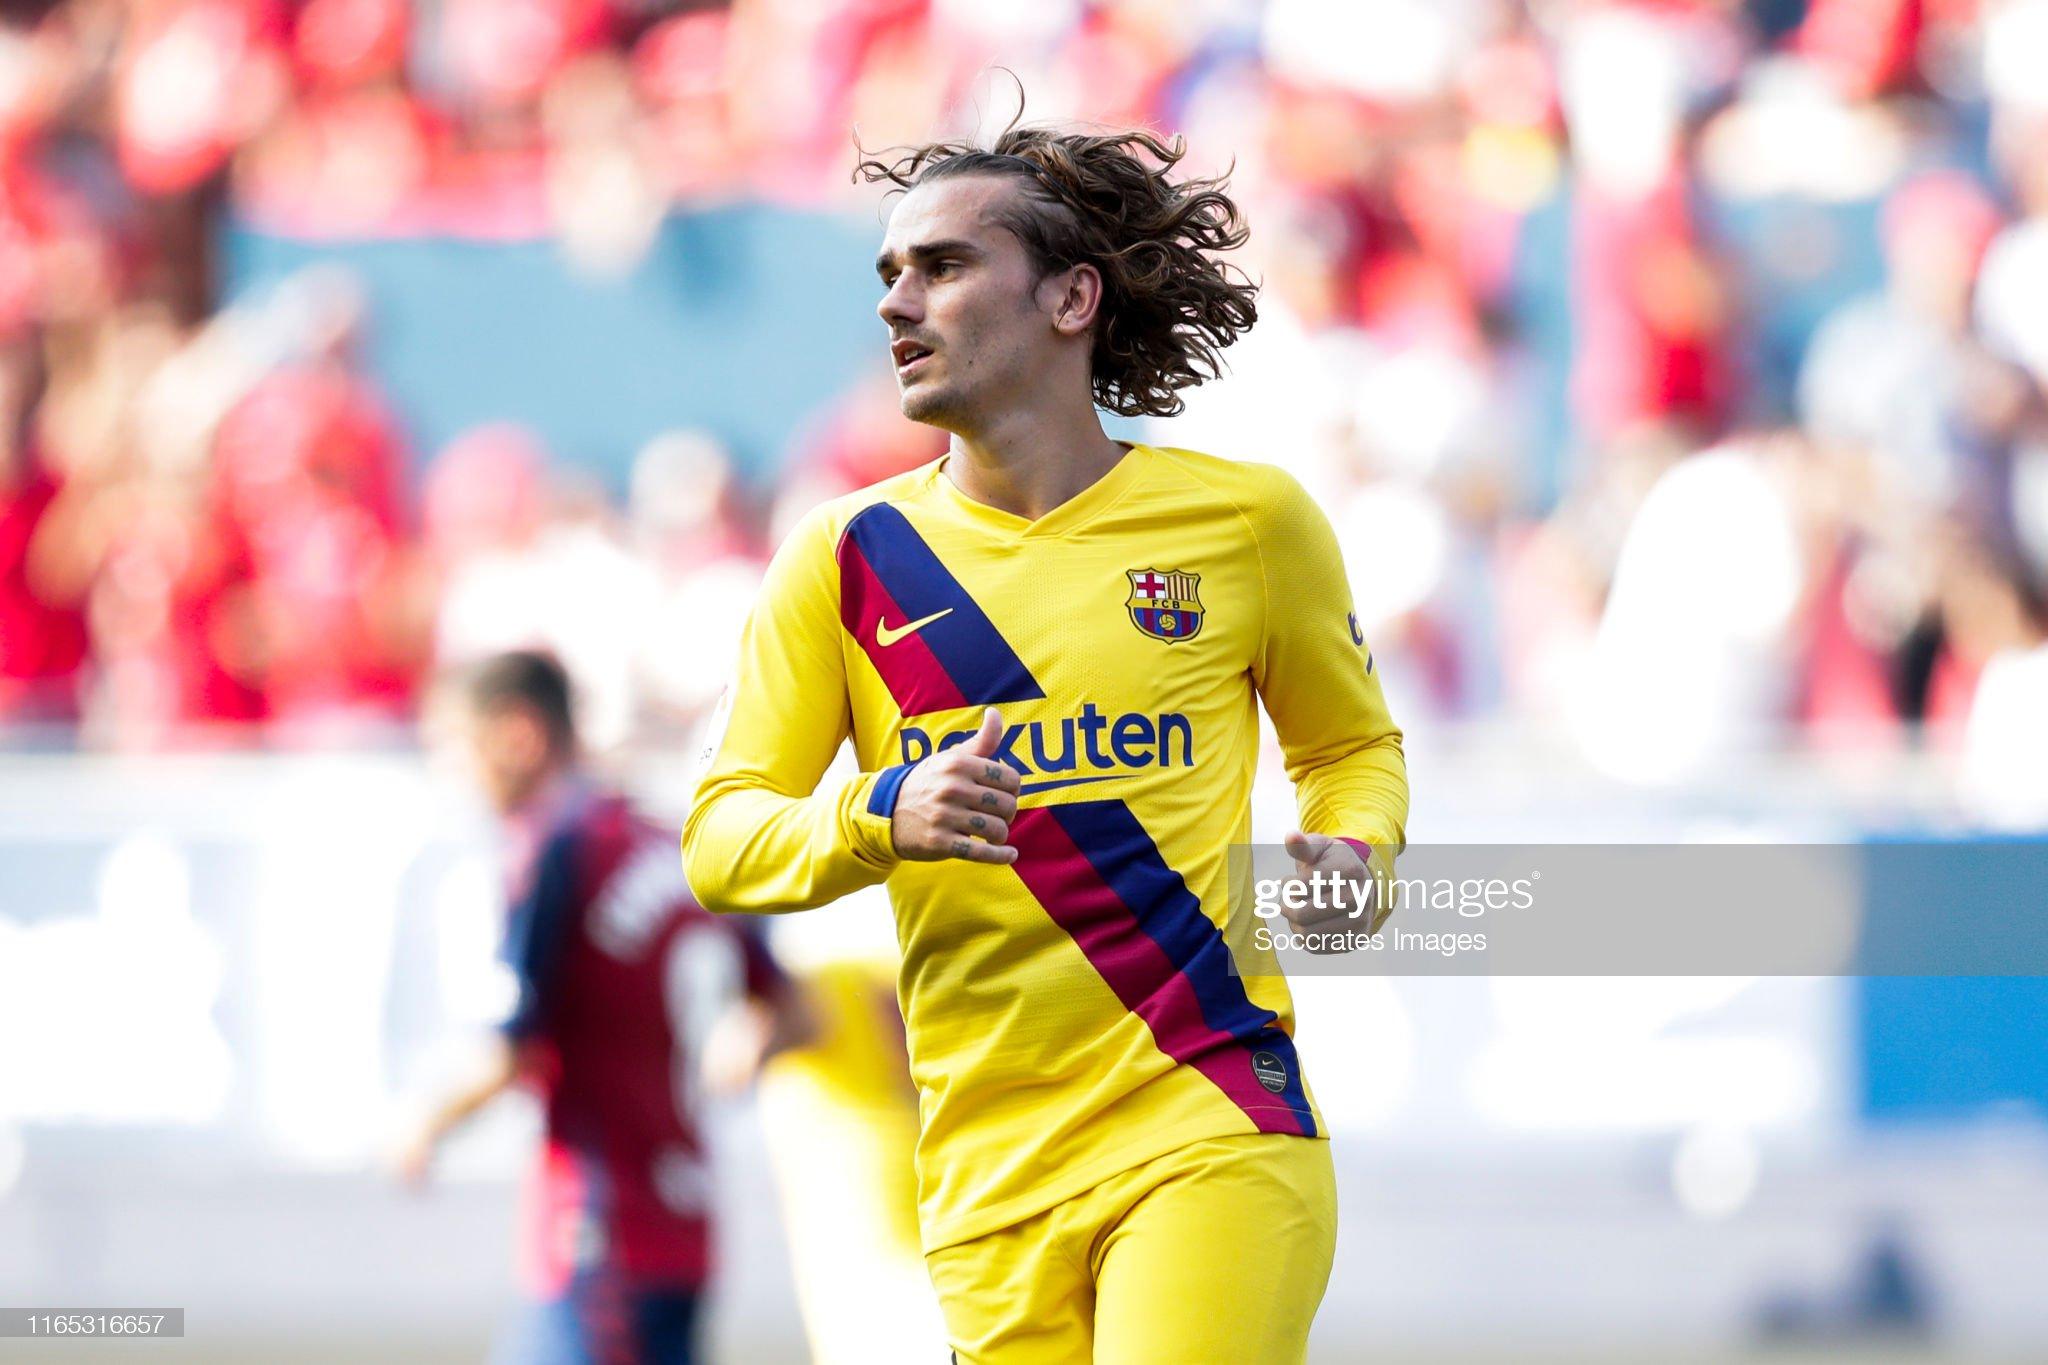 صور مباراة : أوساسونا - برشلونة 2-2 ( 31-08-2019 )  Antoine-griezmann-of-fc-barcelona-during-the-la-liga-santander-match-picture-id1165316657?s=2048x2048